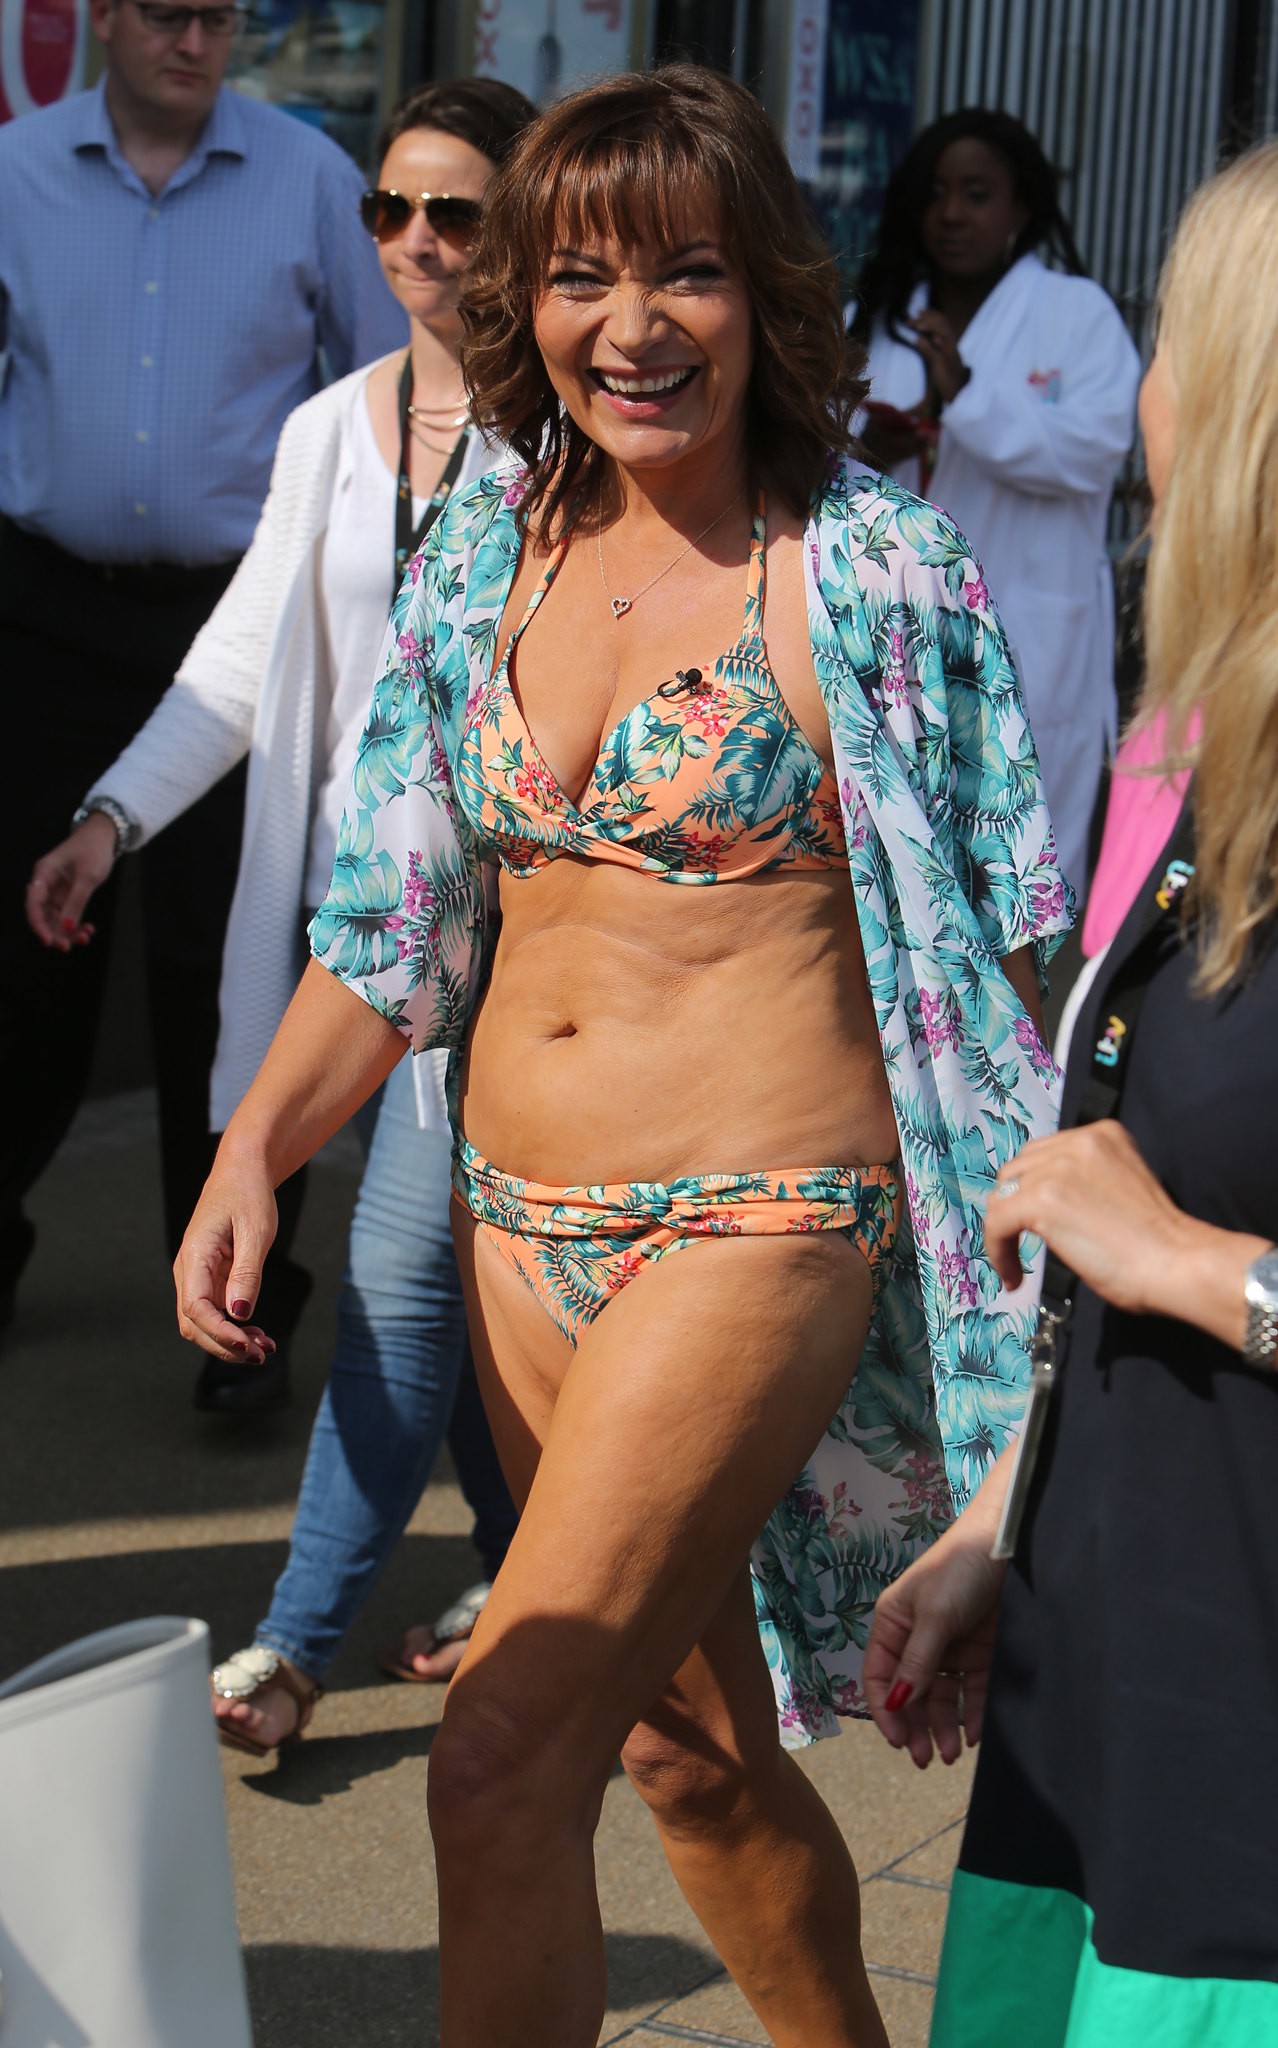 Lorraine Kelly looks incredible in